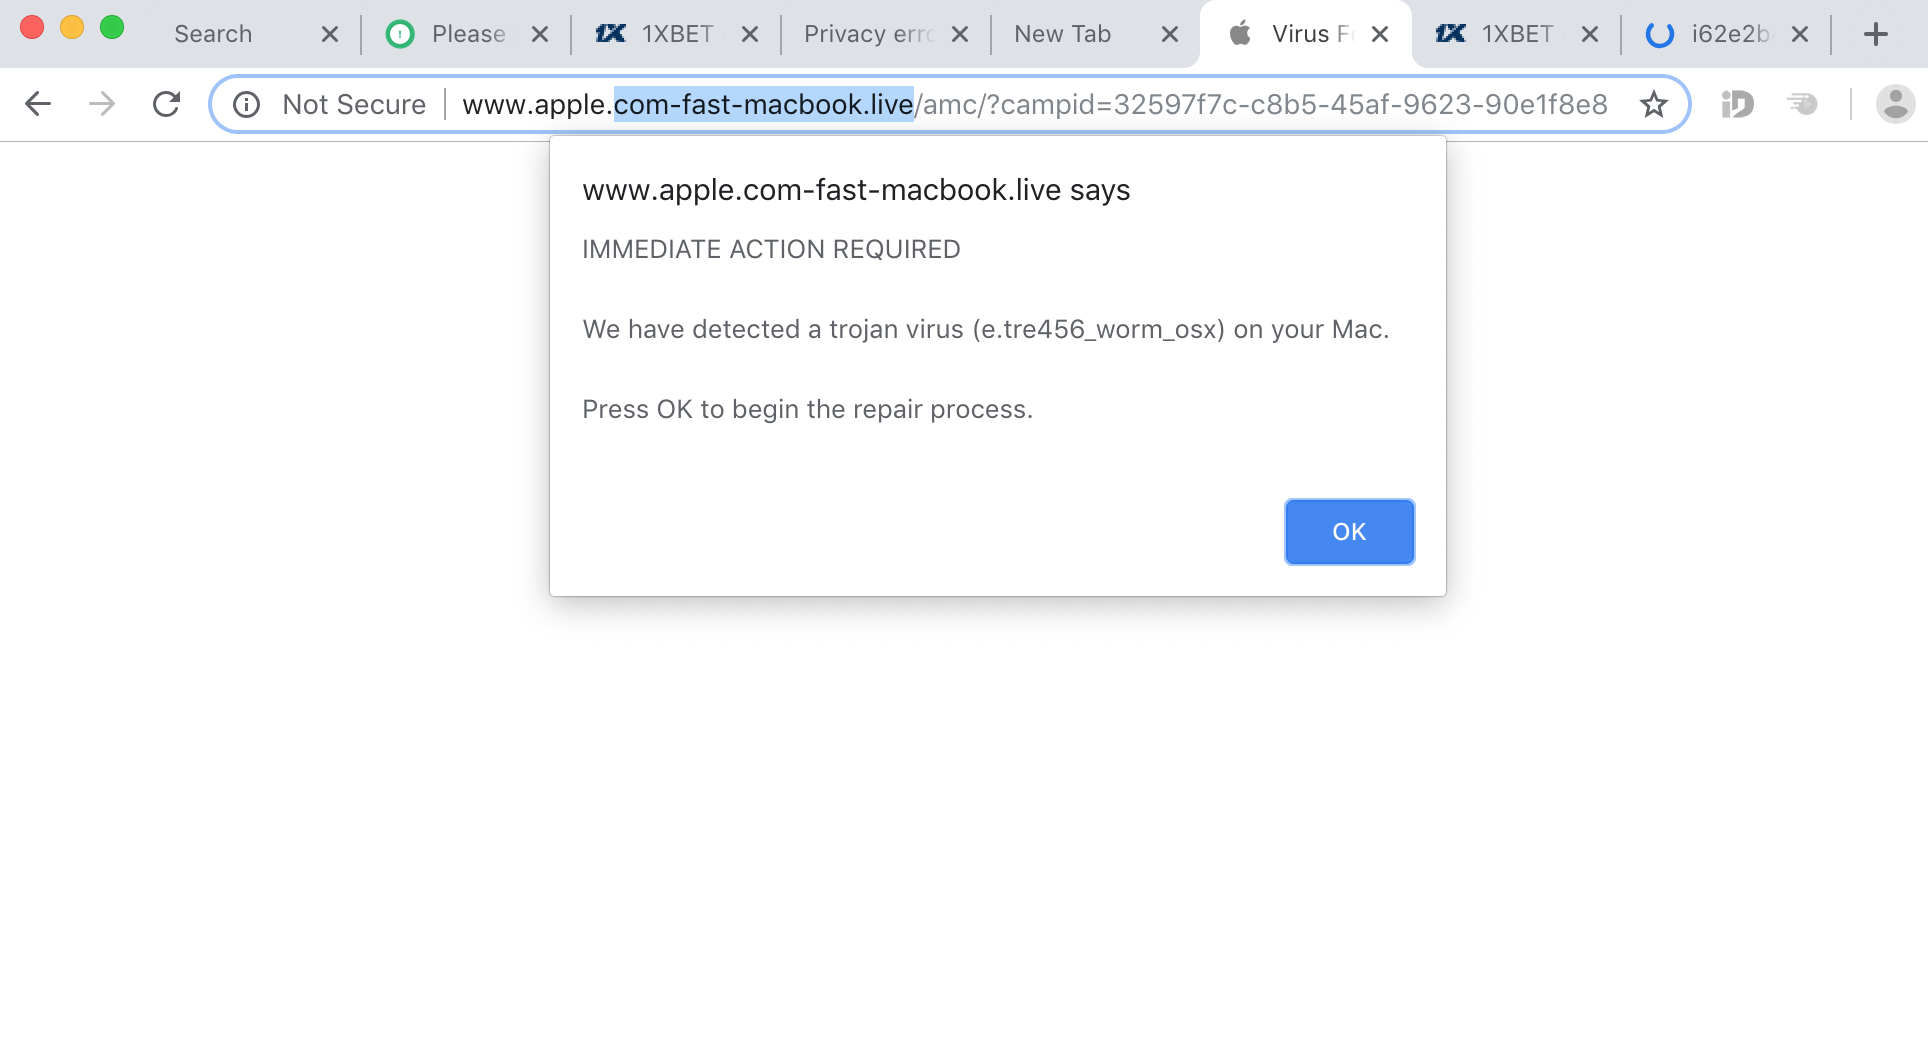 Apple.com-fast-macbook.live scam